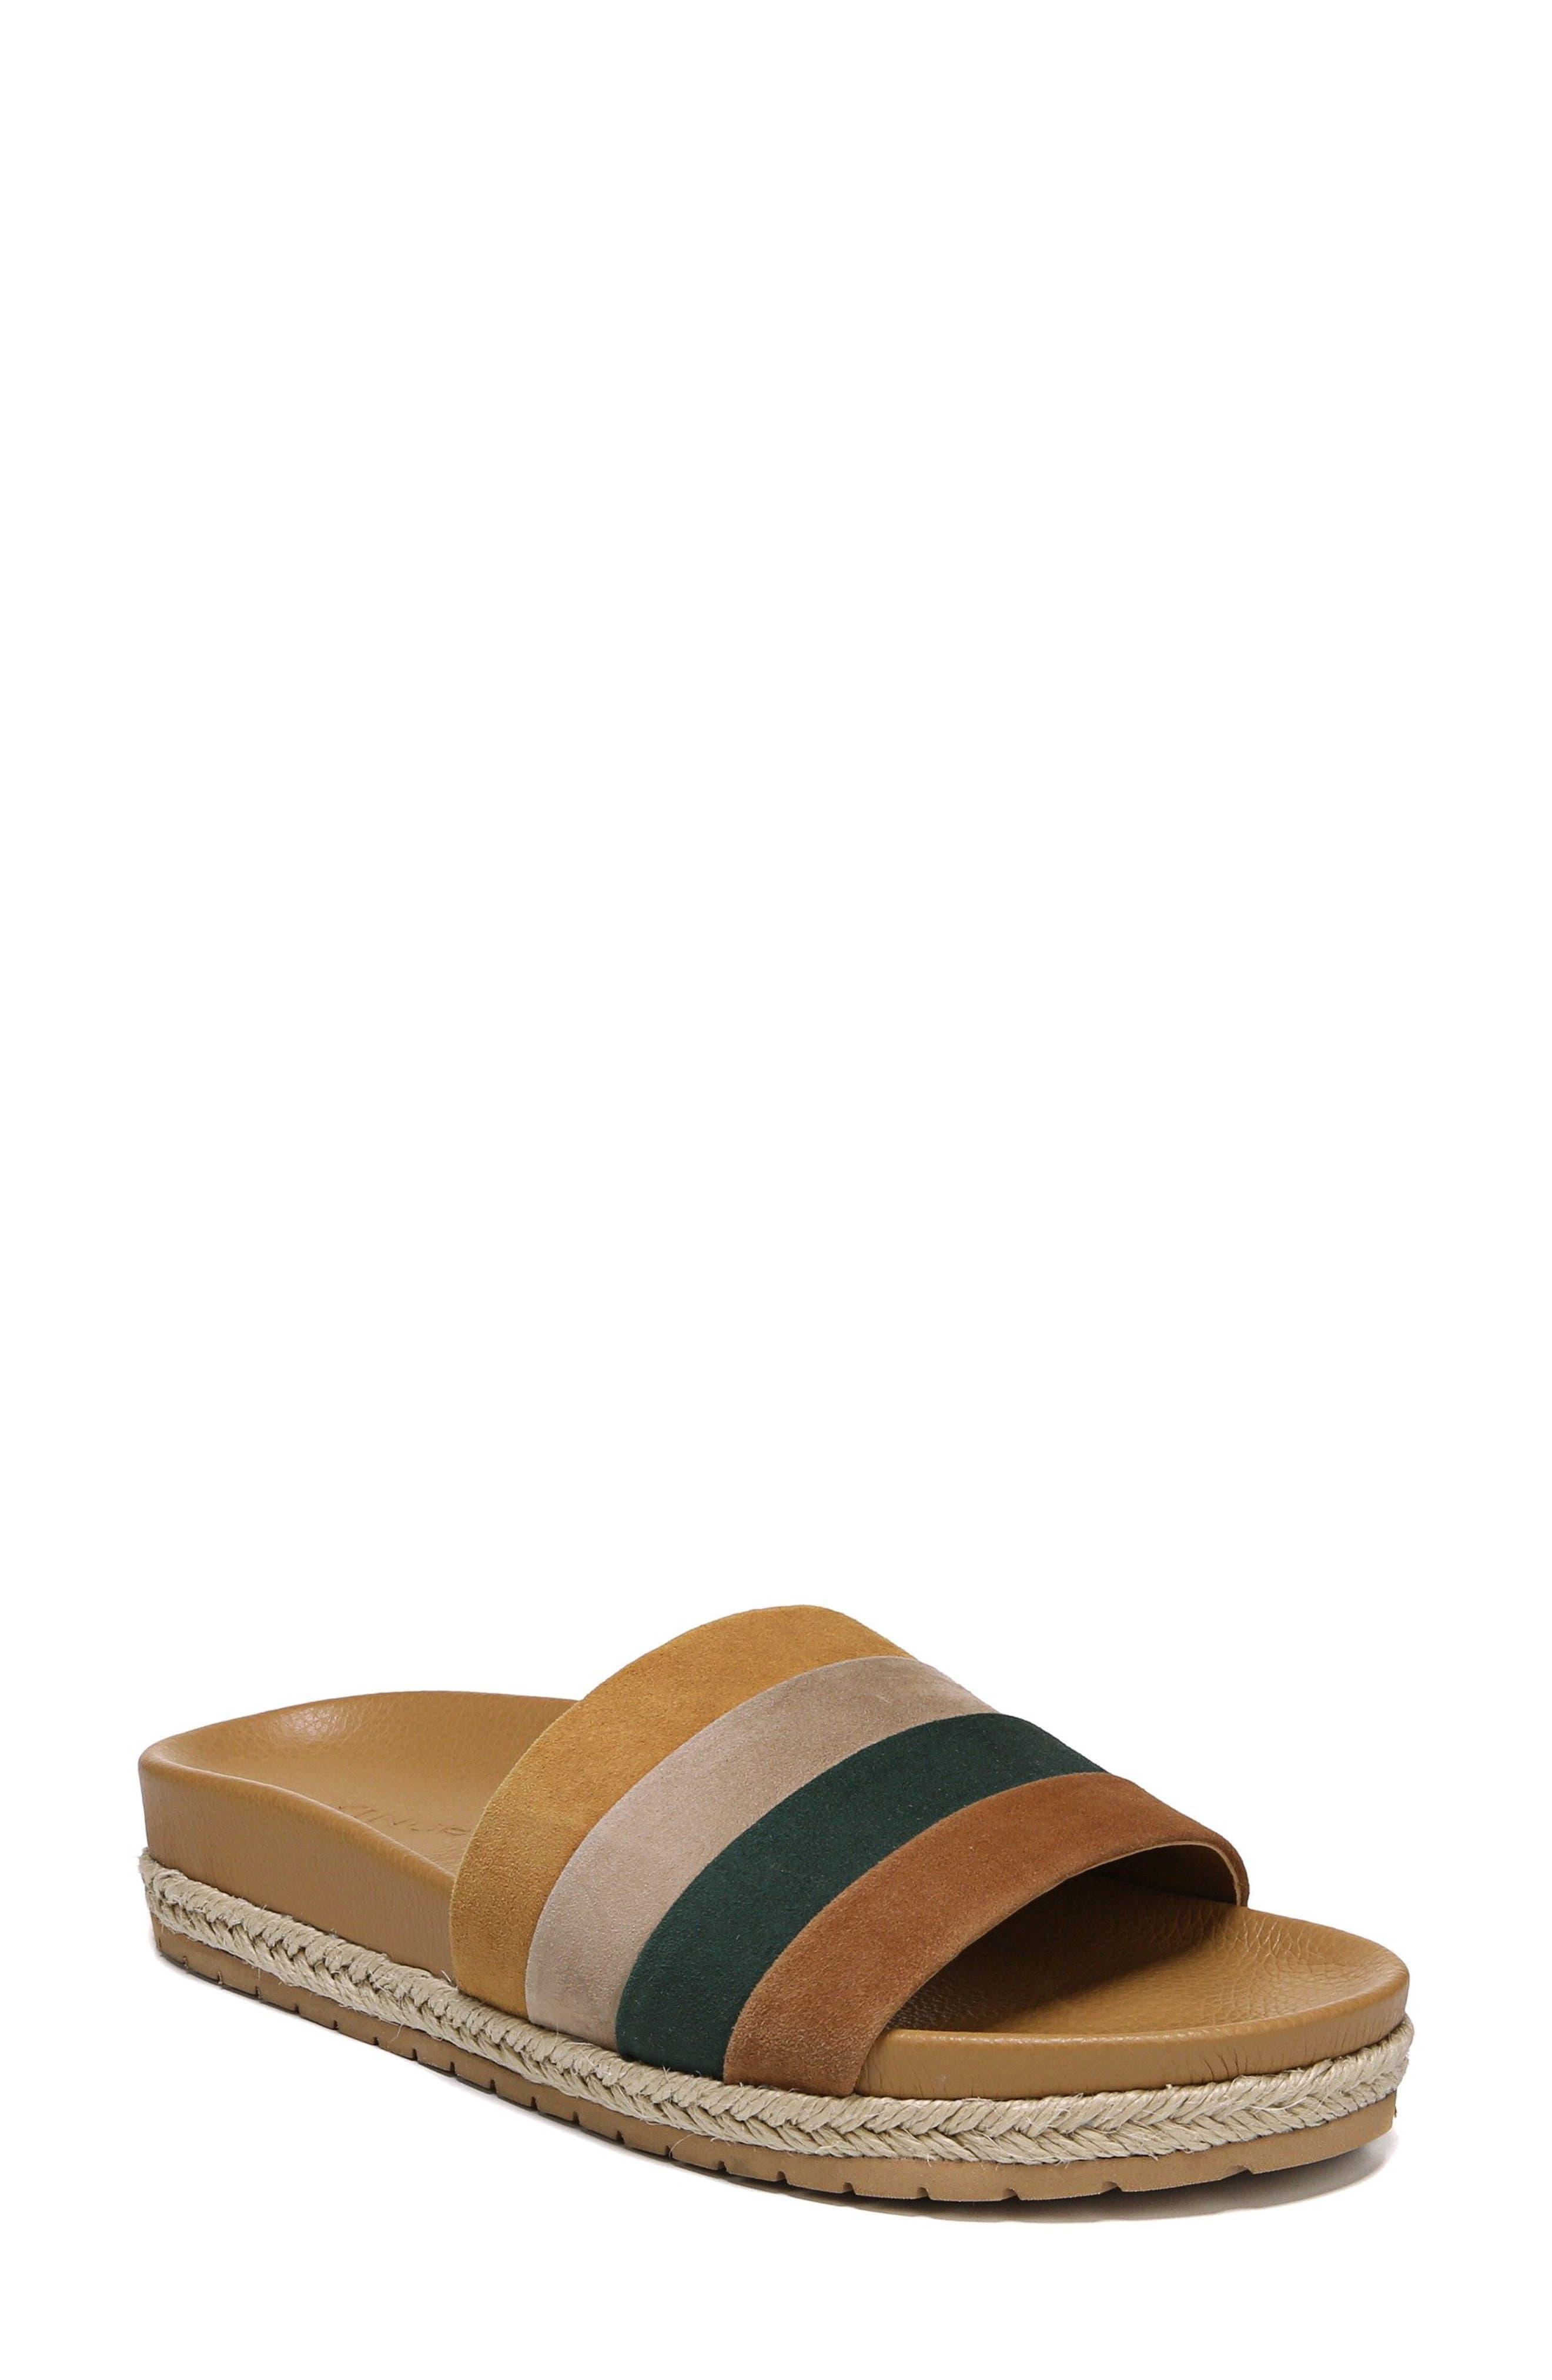 Alisa Striped Slide Sandal,                             Main thumbnail 1, color,                             Cedar Multi